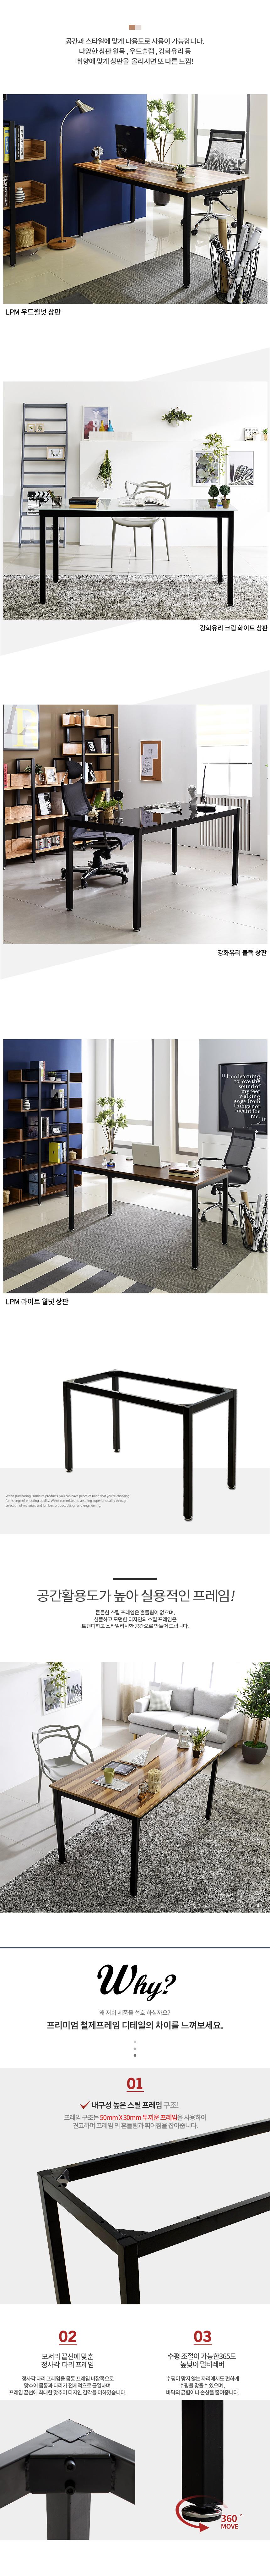 T4 1200 철제프레임 - 동화속나무, 92,000원, DIY 책상/의자, DIY 책상/테이블